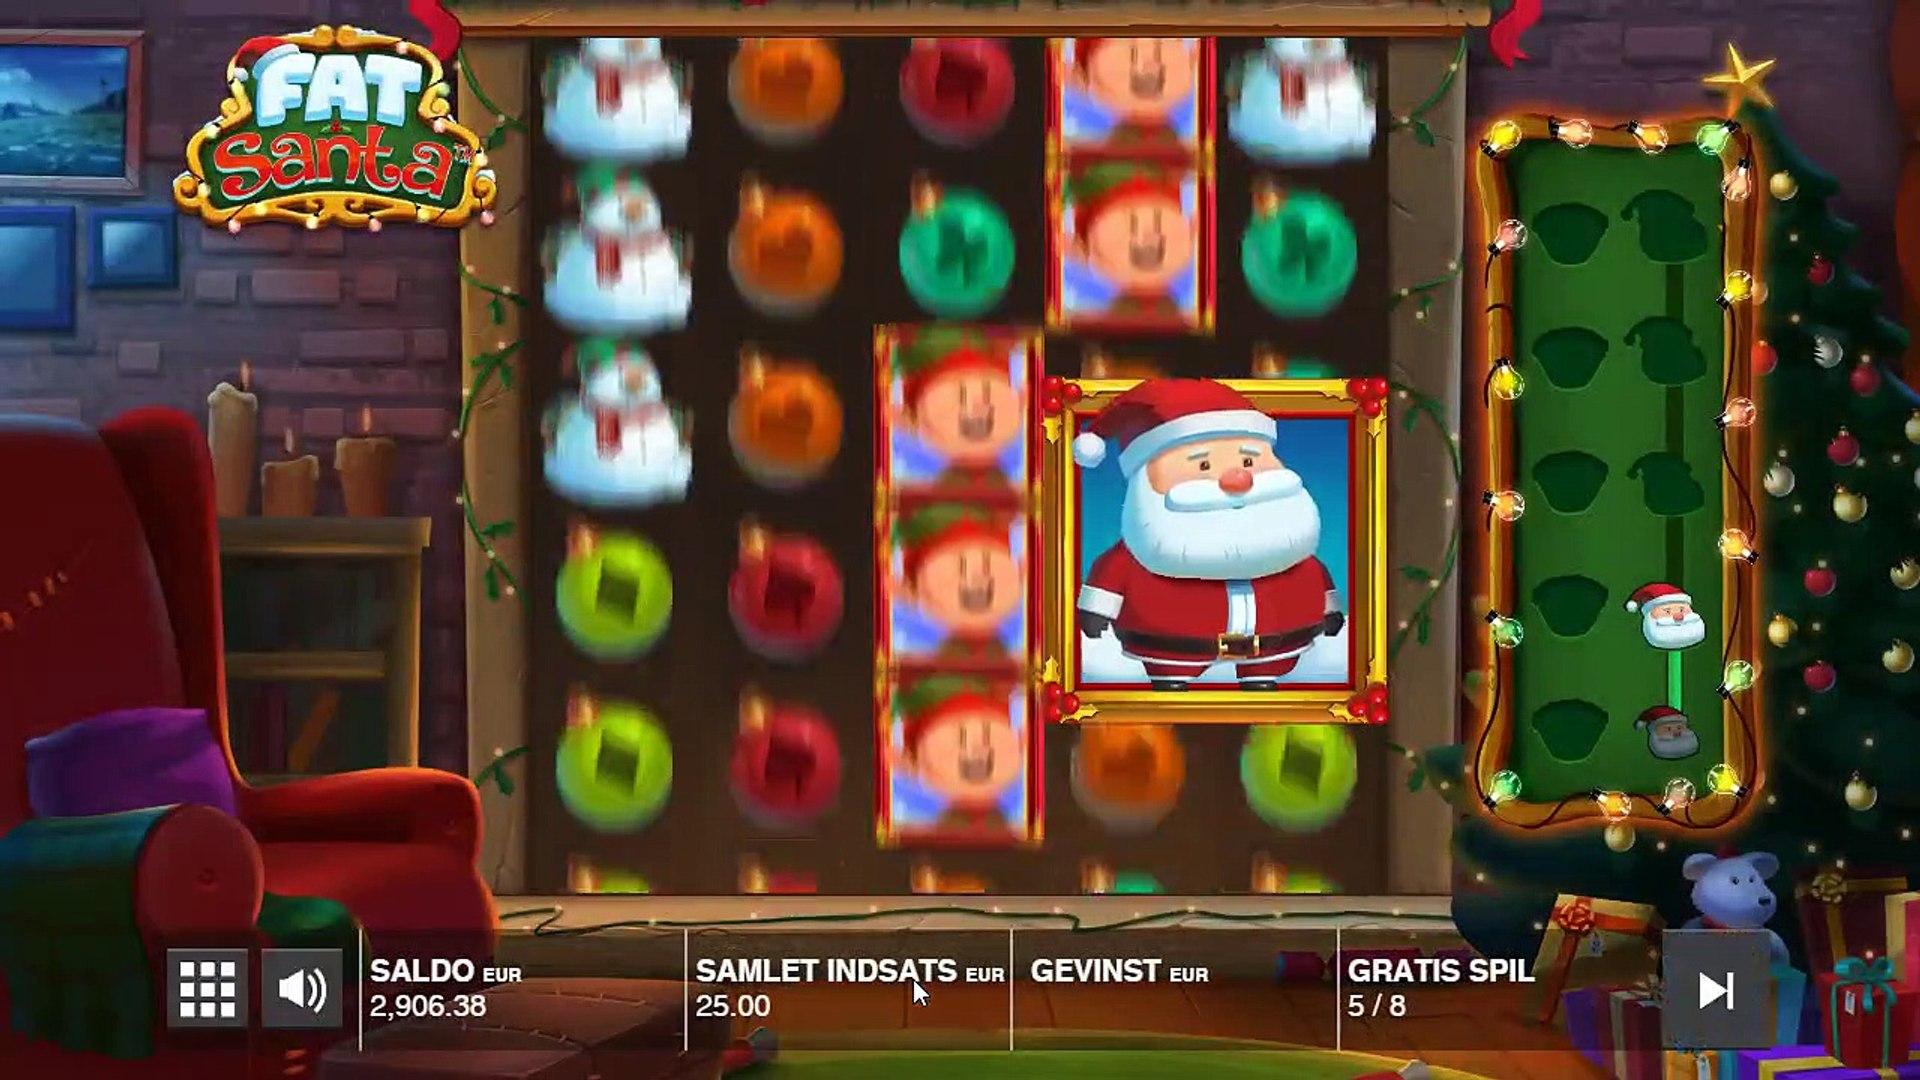 Mr Green Casino - Fat Santa Spillemaskine